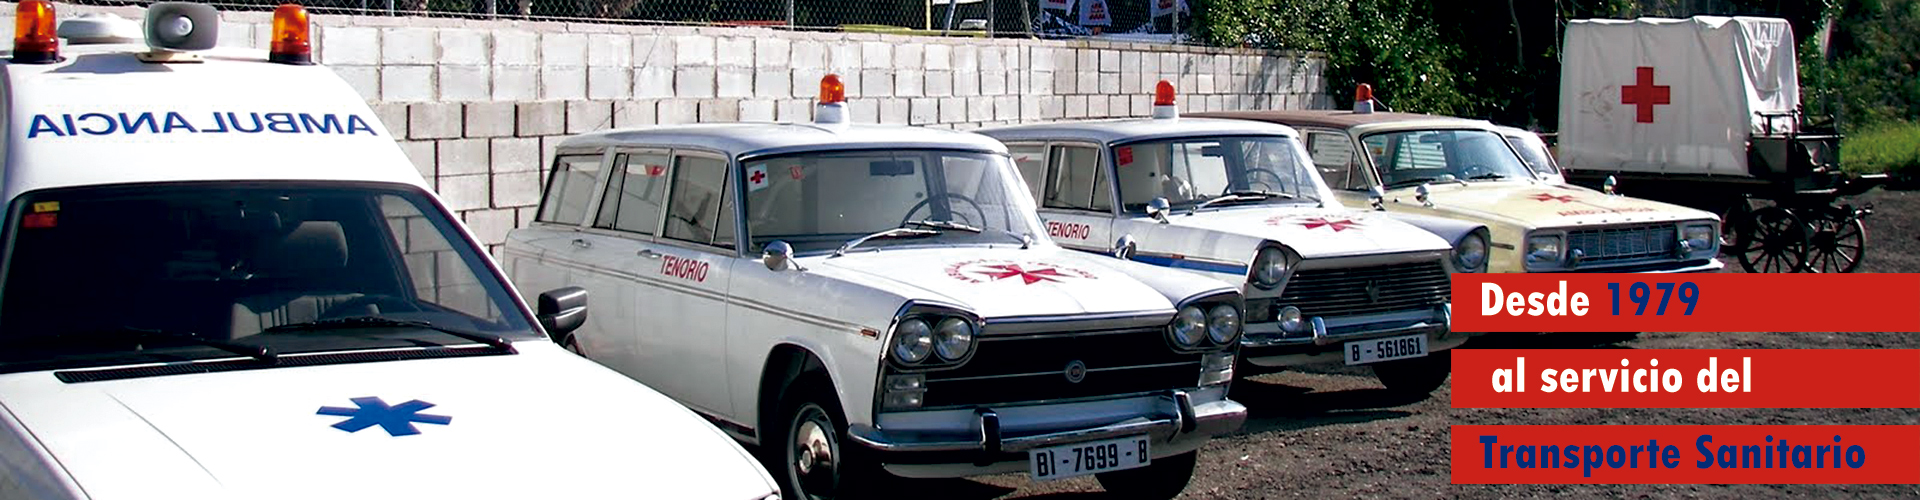 ambulancia-antiguas